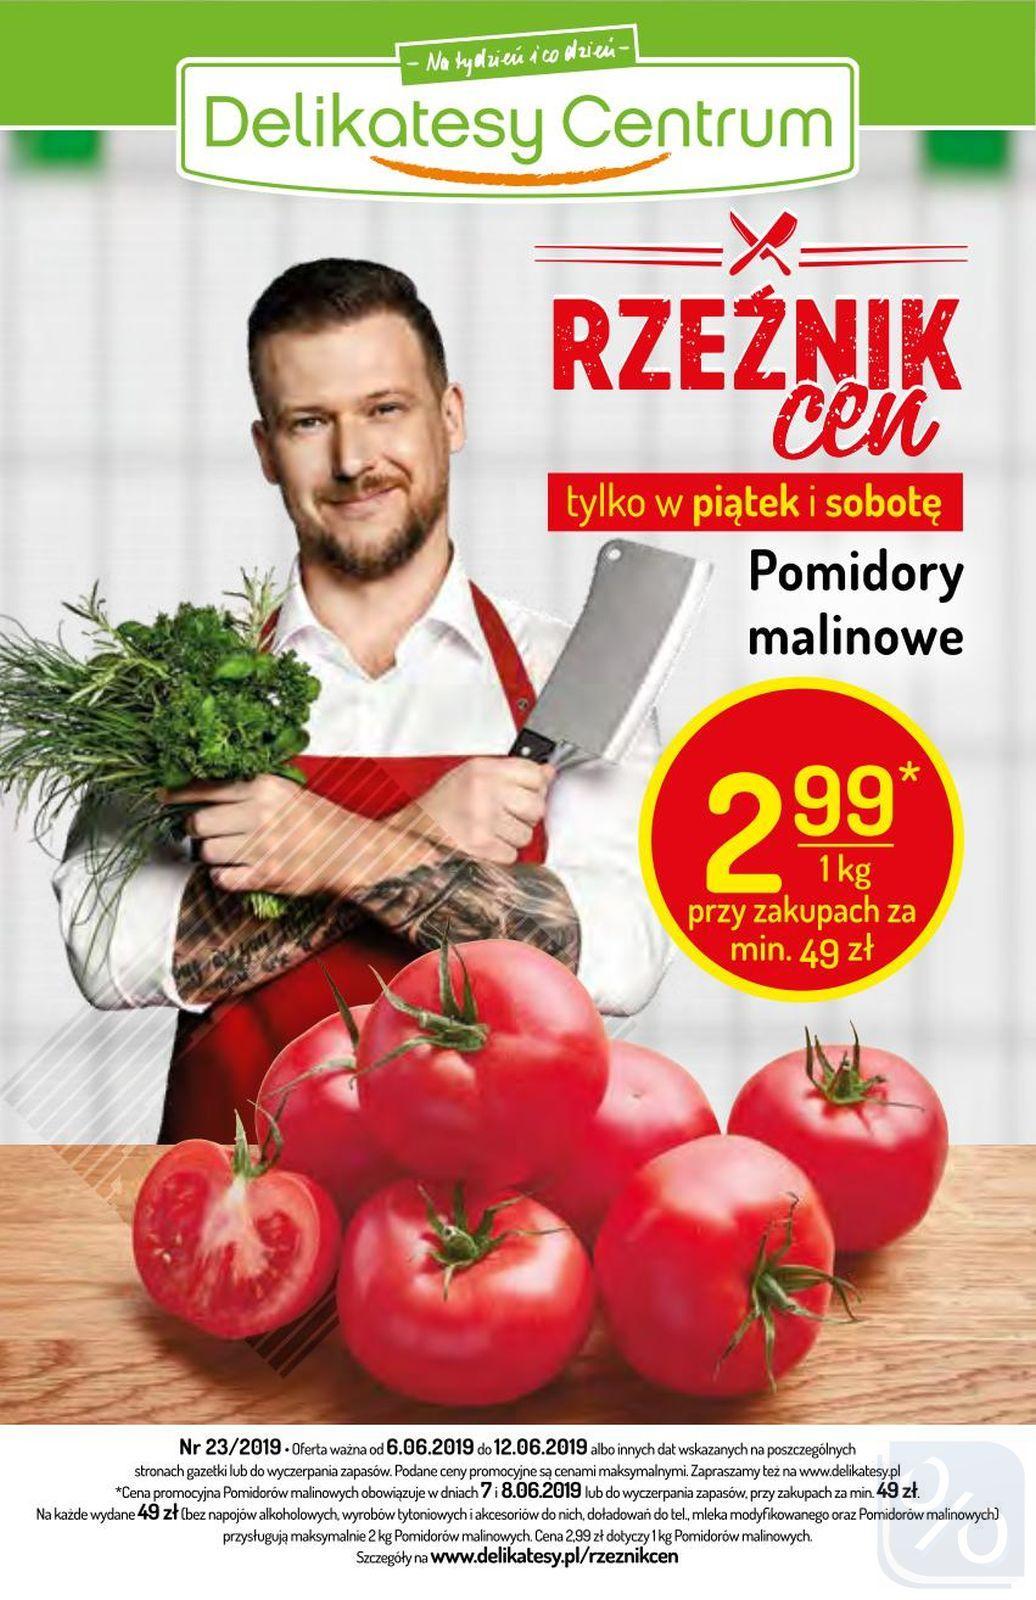 Gazetka promocyjna Delikatesy Centrum do 12/06/2019 str.1